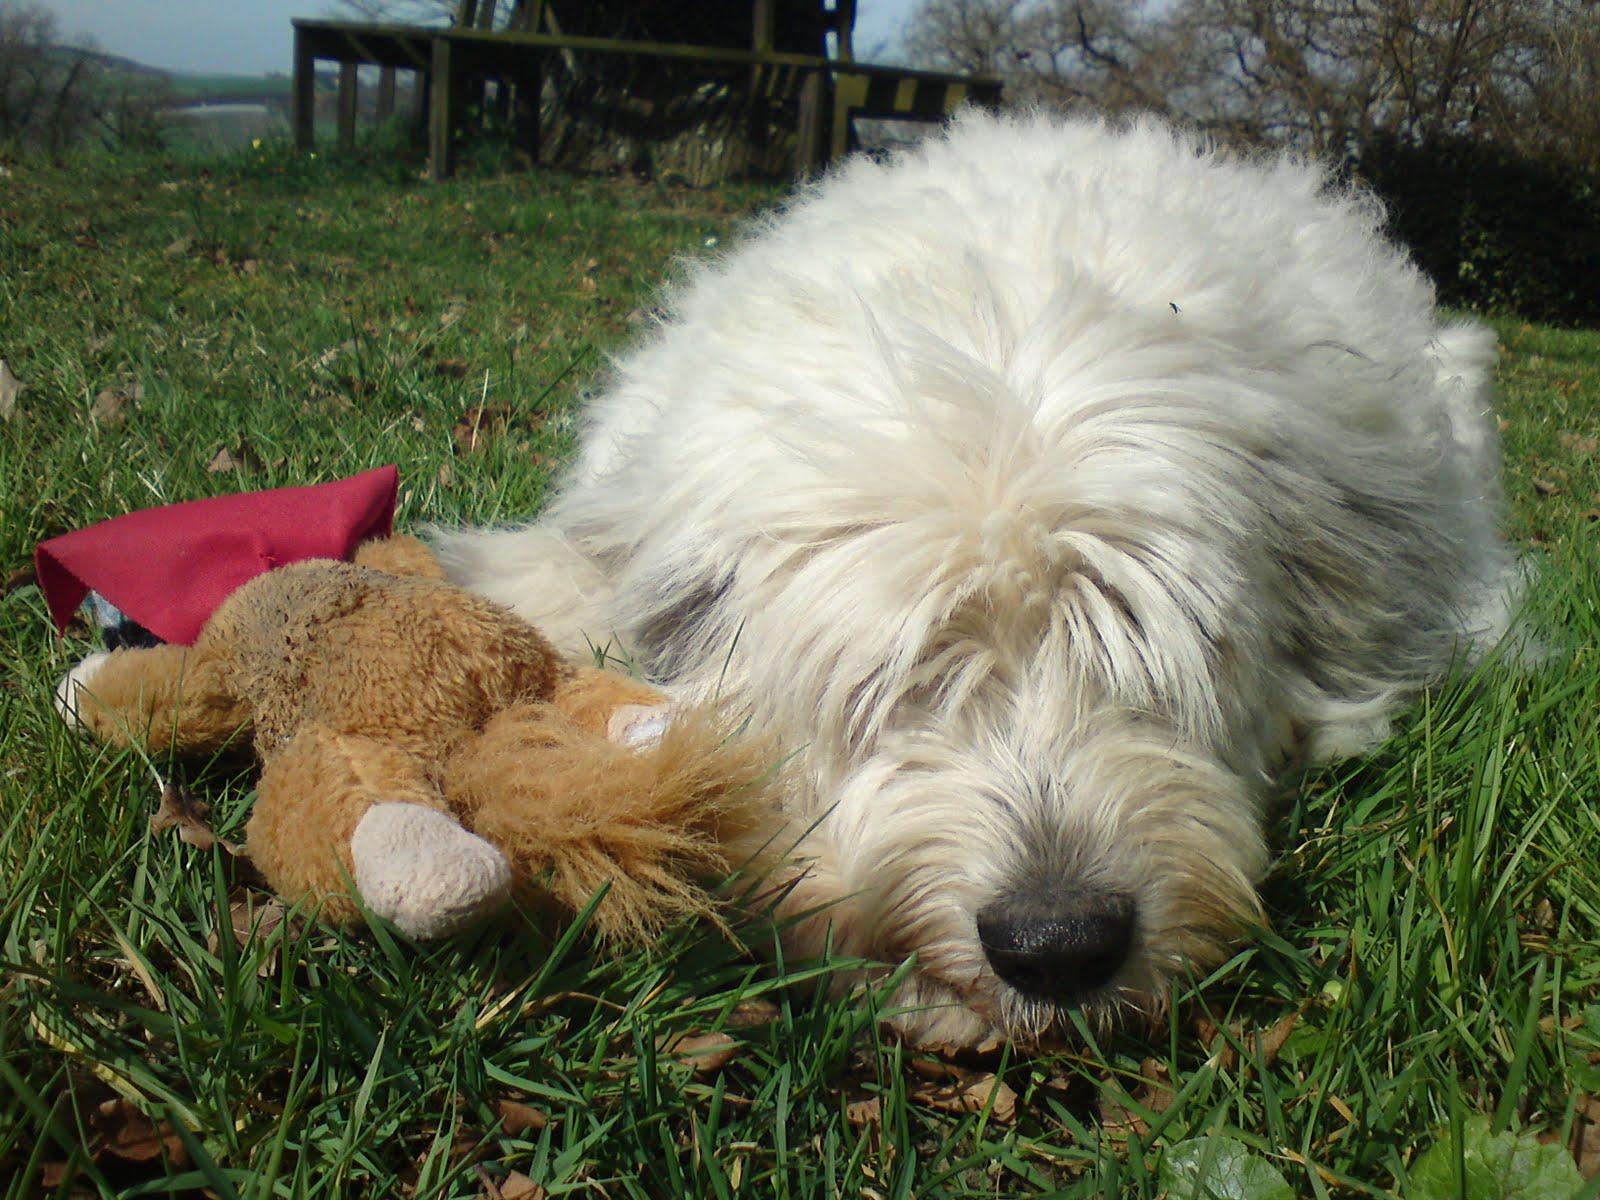 ... breeds black shaggy dog breeds shaggy dogs medium shaggy dog breeds